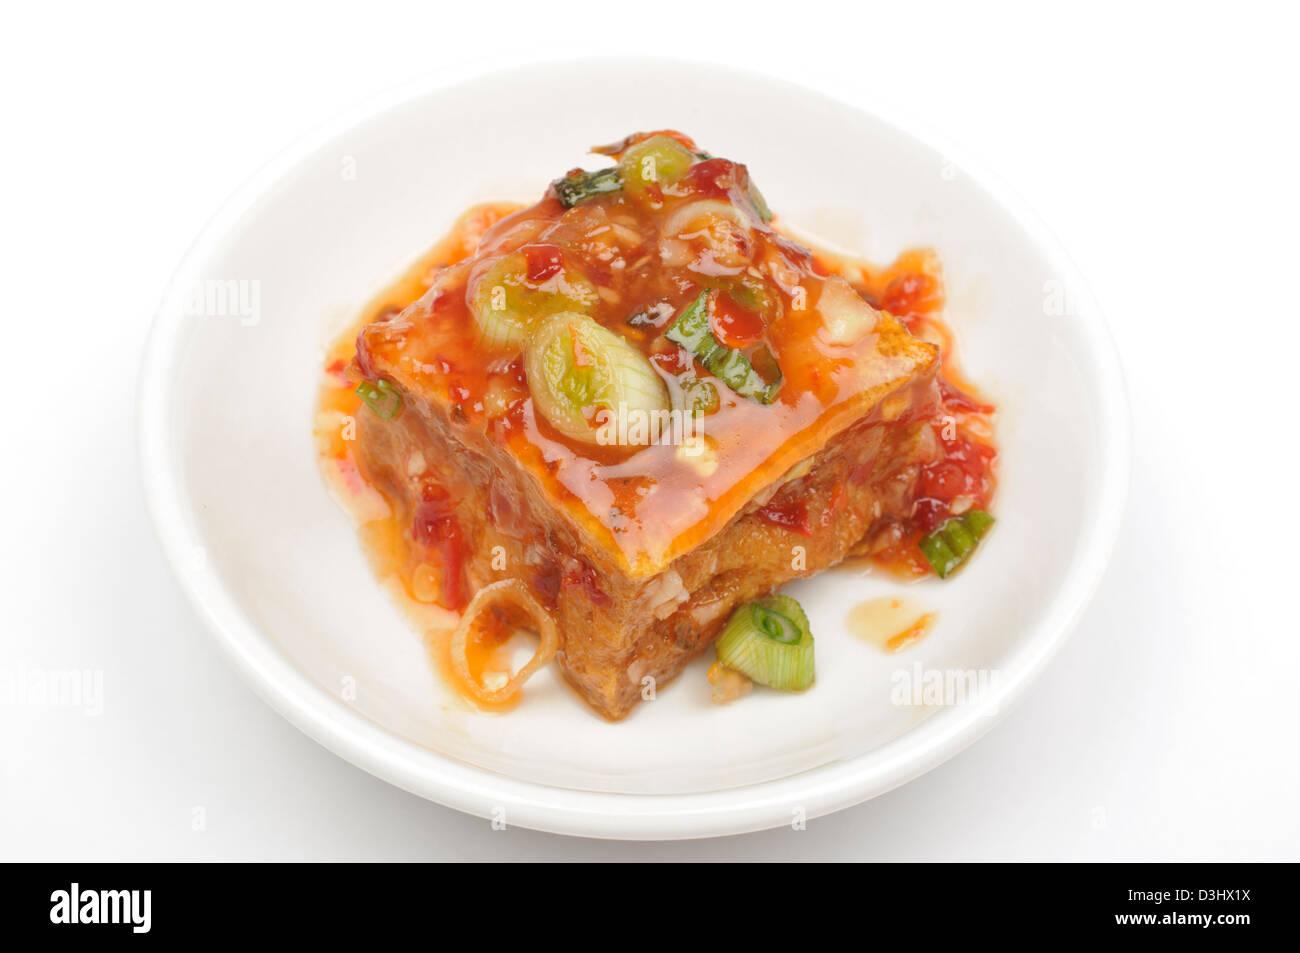 Tofu and sauce - Stock Image